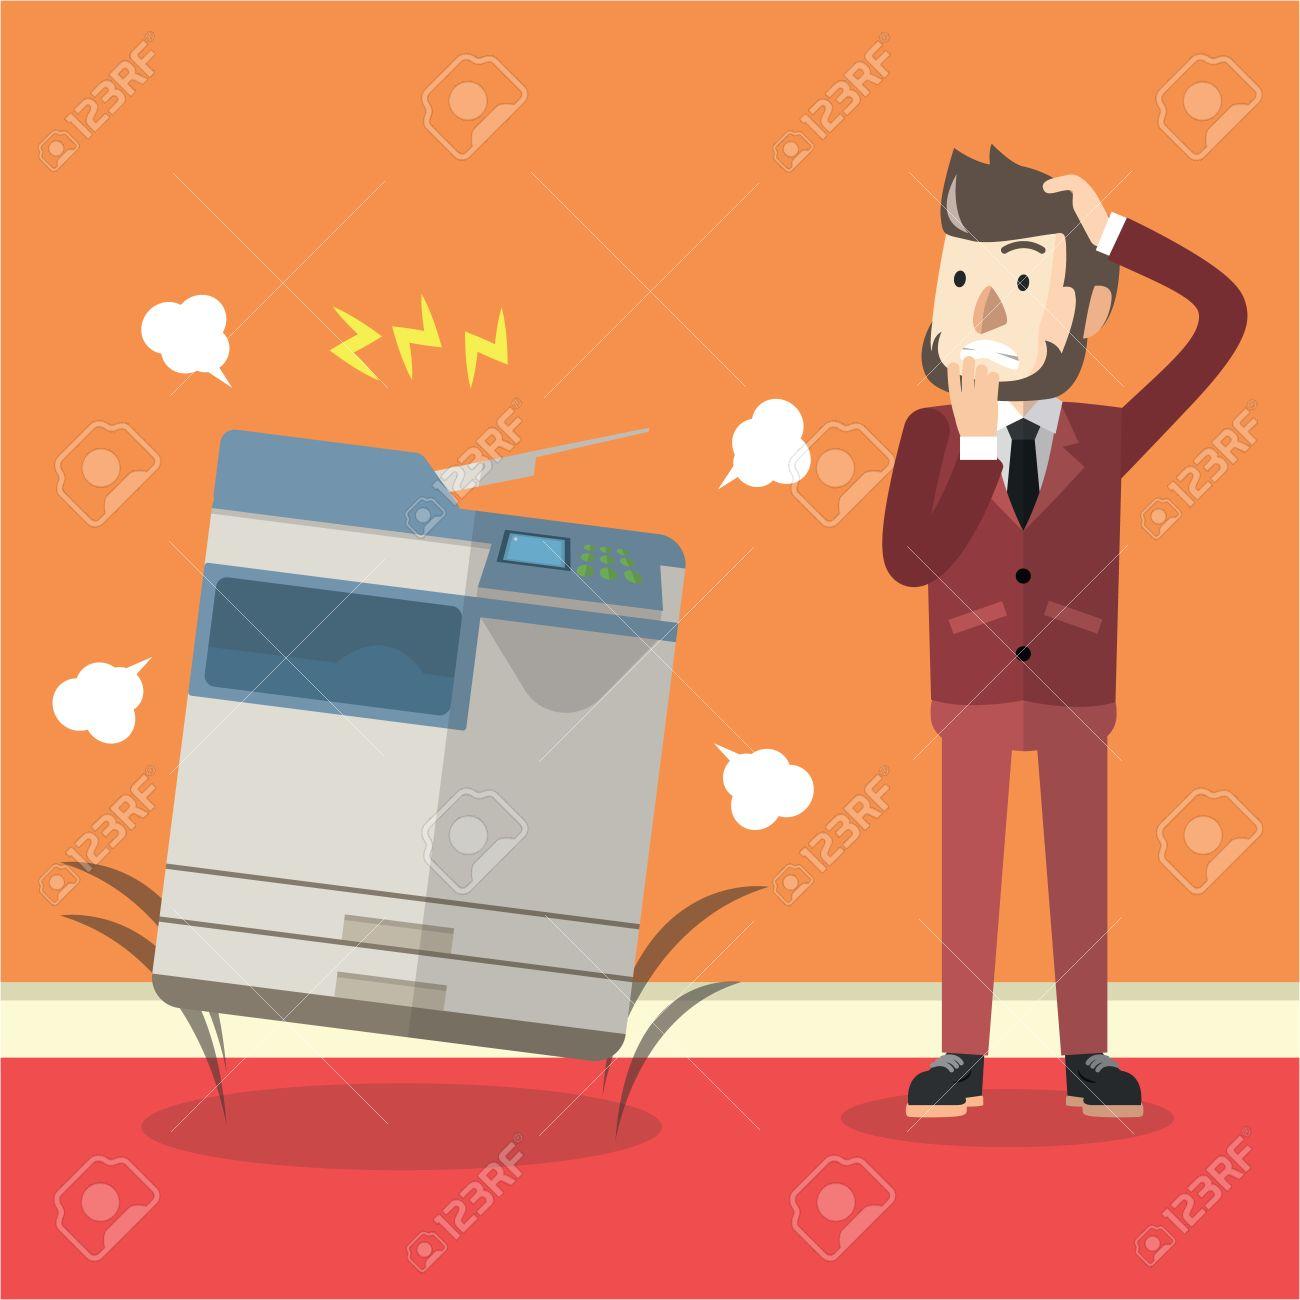 Bad photocopier machine - 56559930